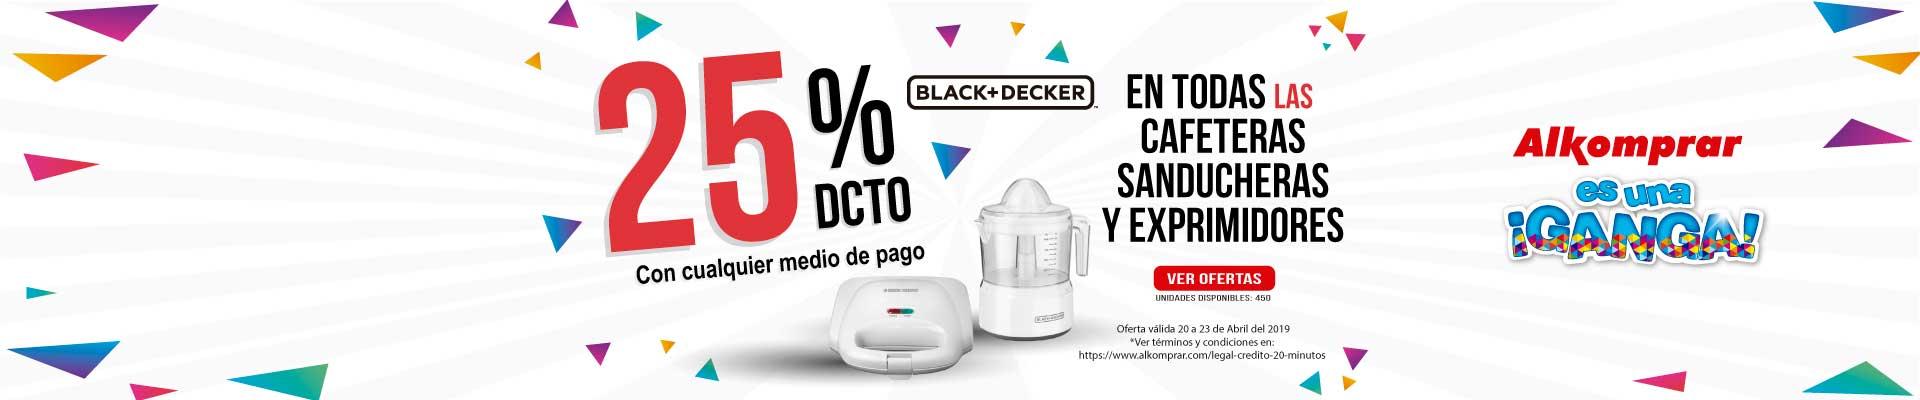 BP ALKP BLACK-DECKER